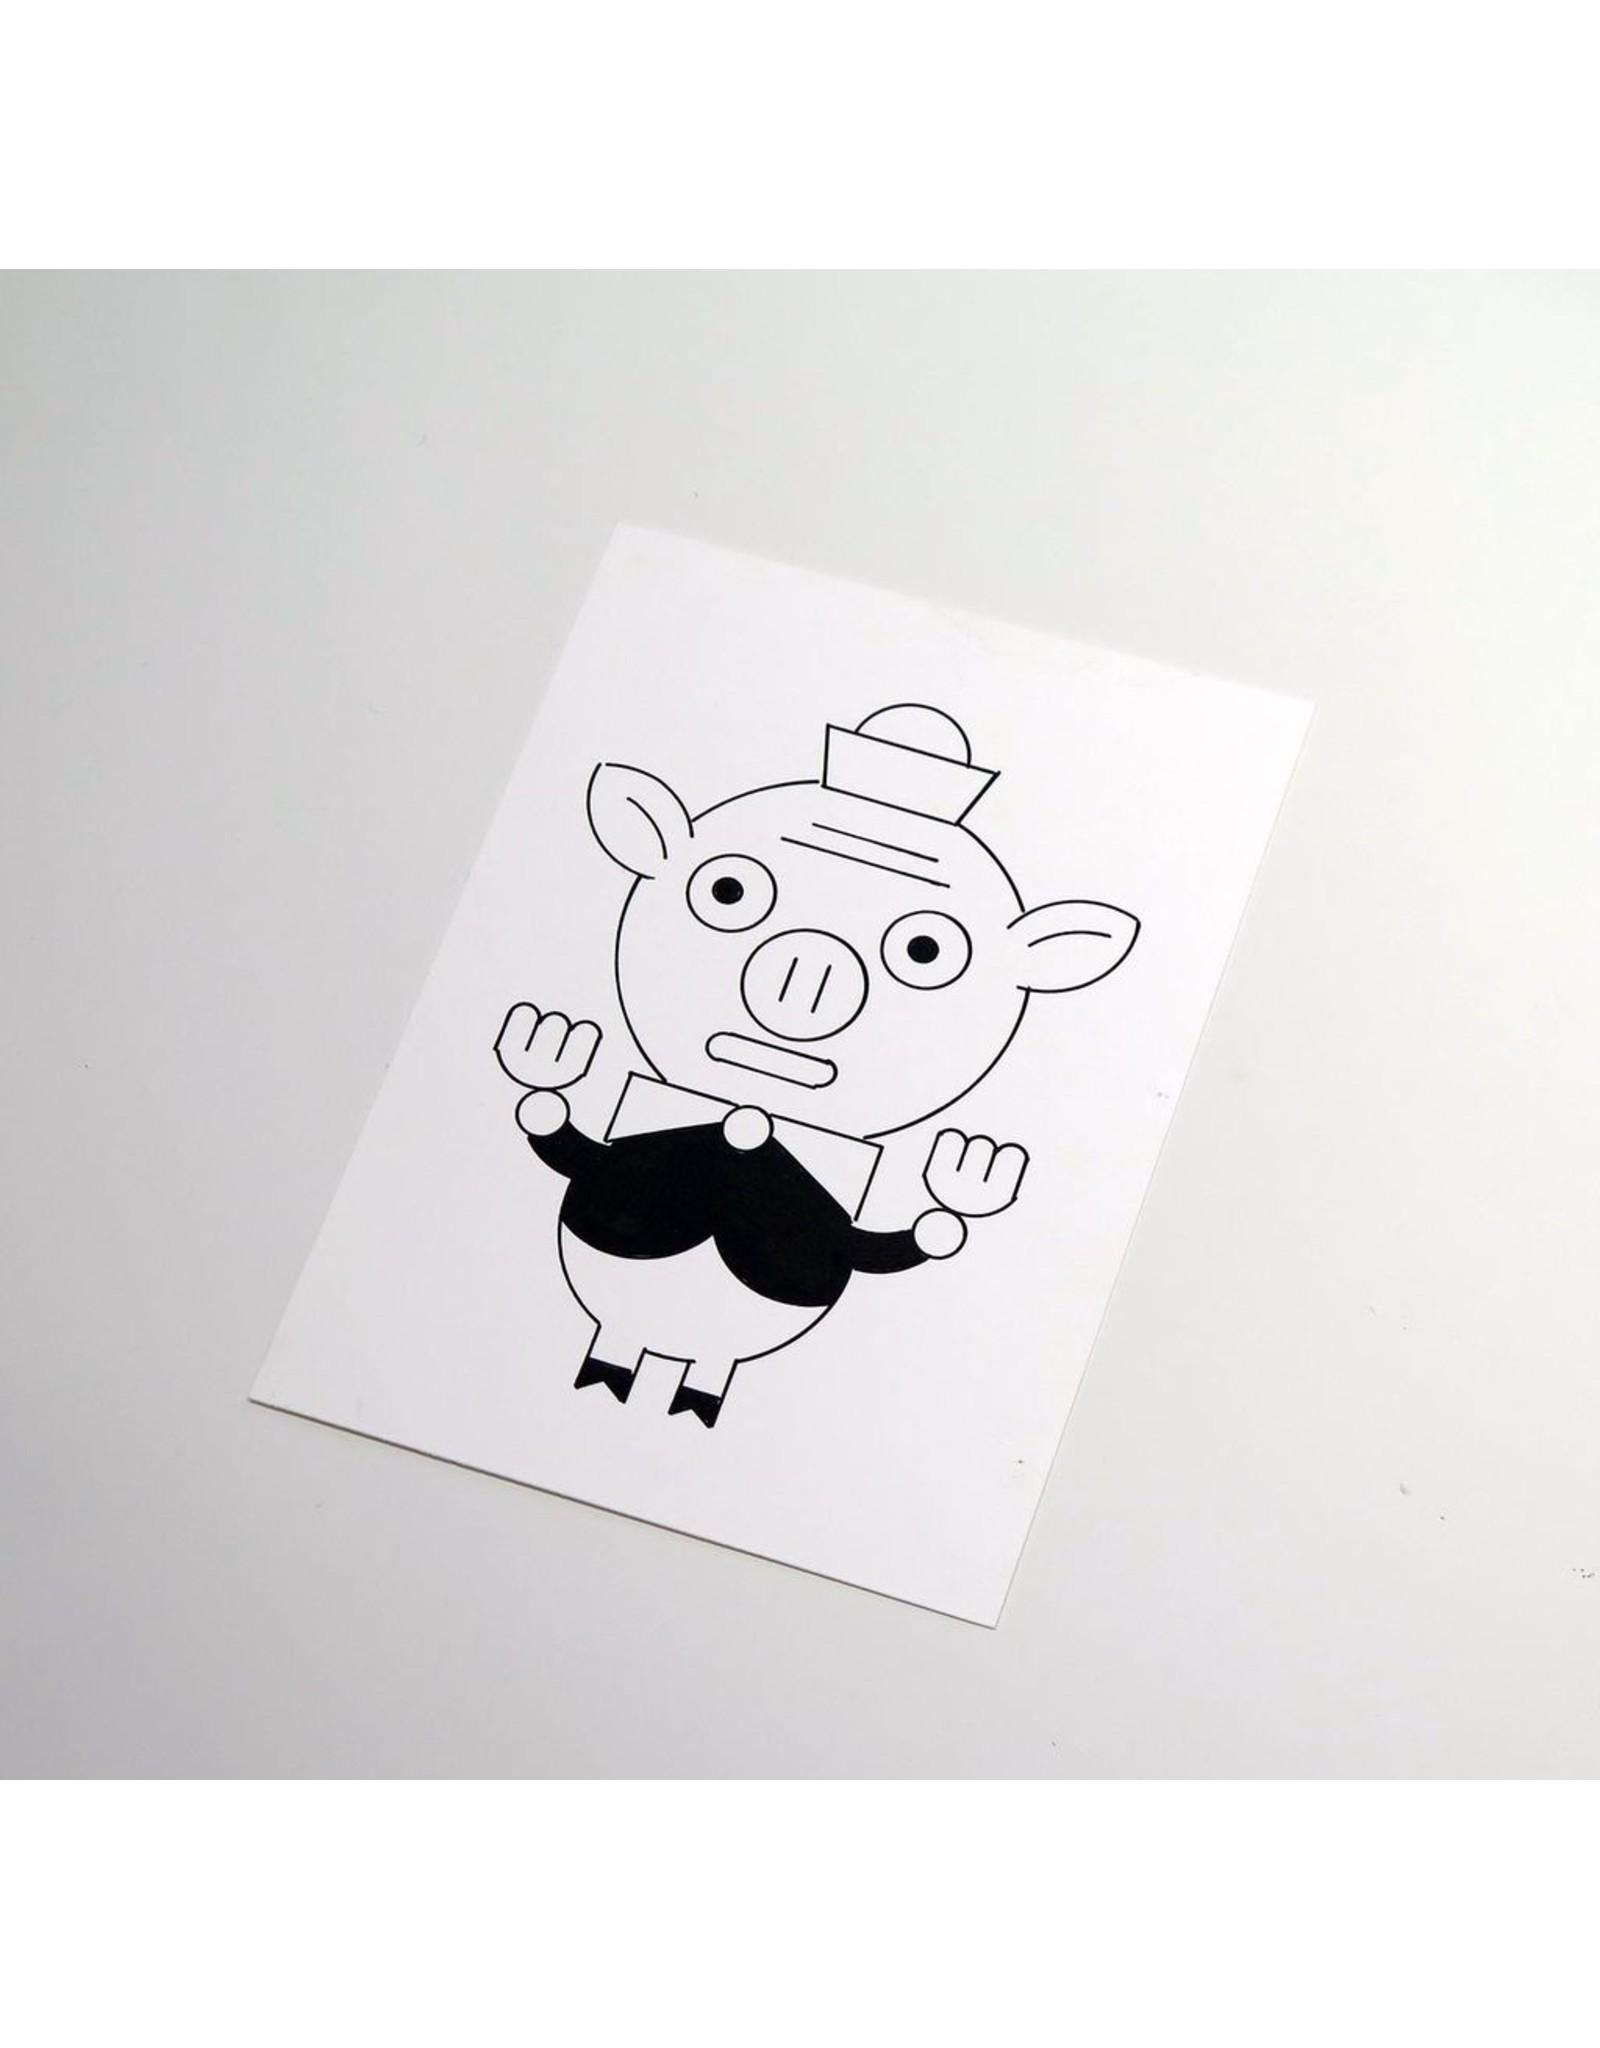 Ivan Brunetti Pig, 2014, Illustration by Ivan Brunetti